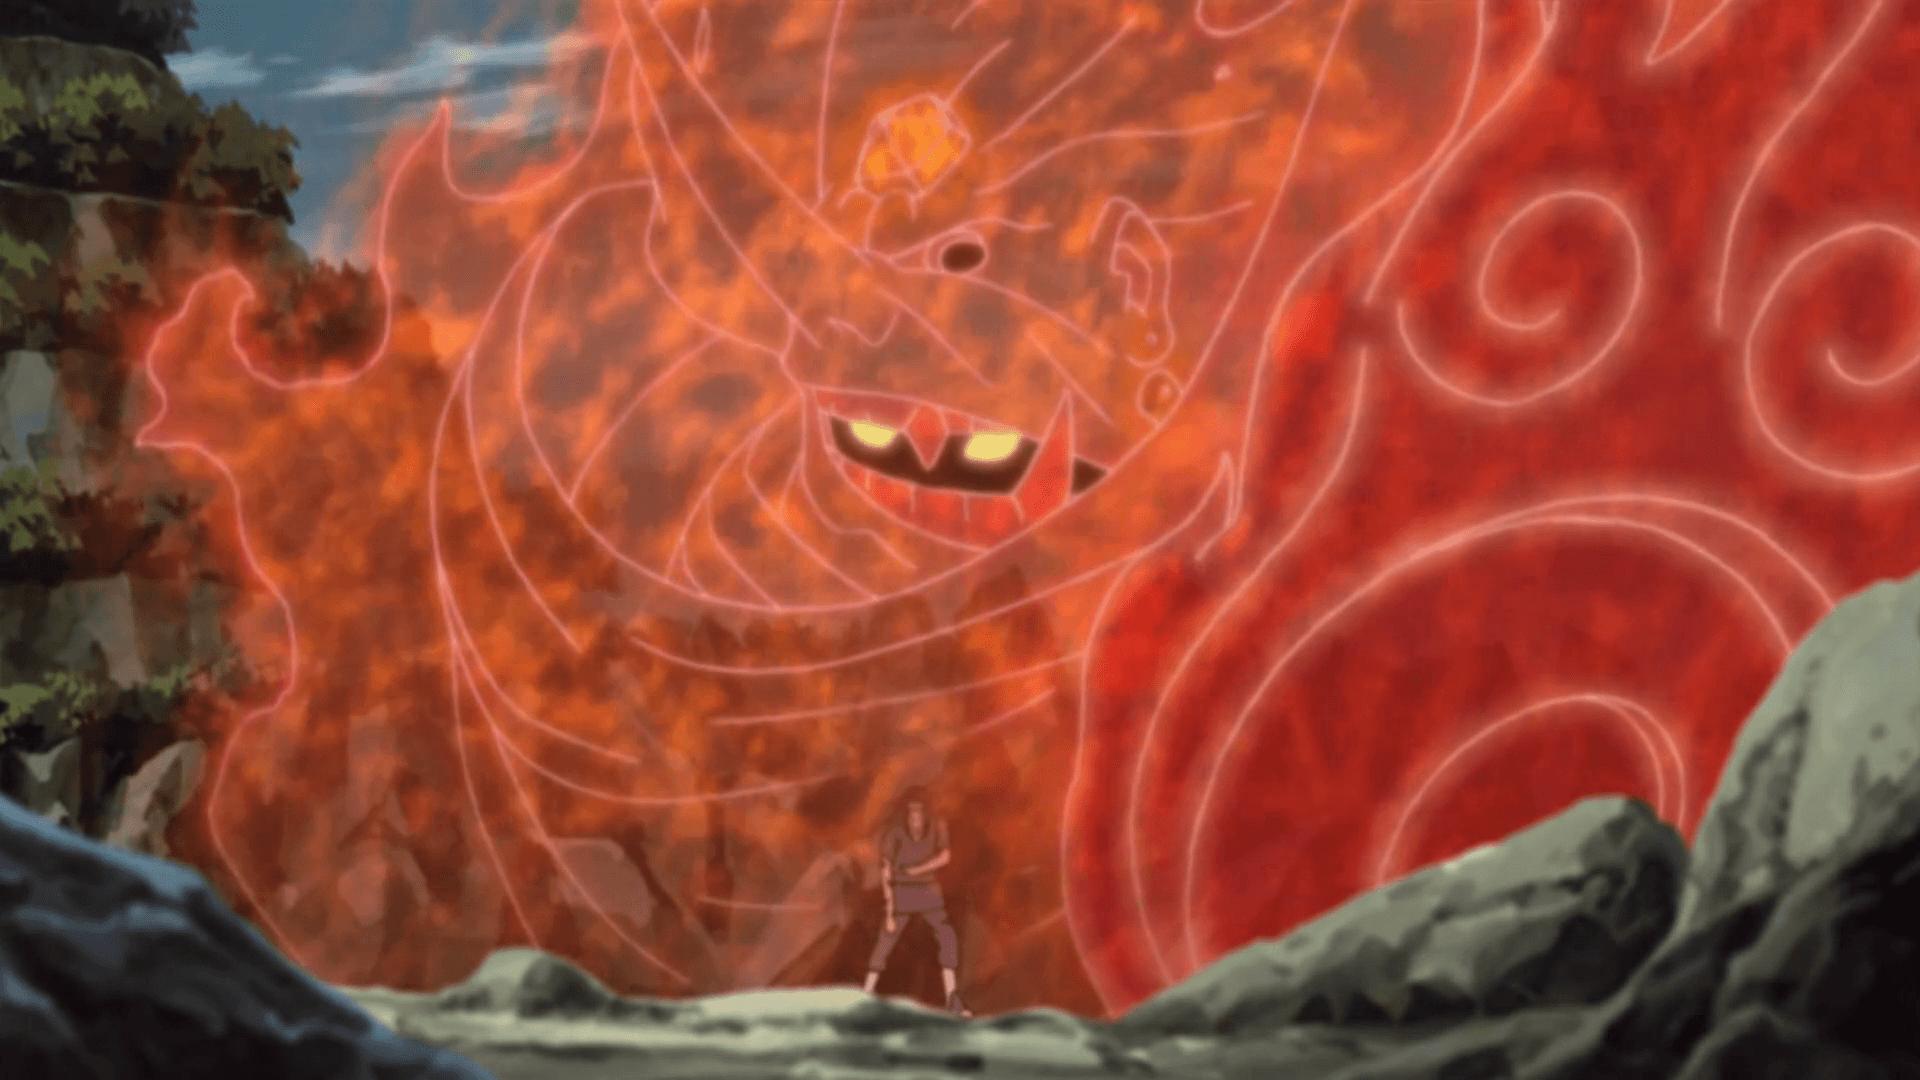 Kakashi Hatake's Susanoo Wallpapers - Wallpaper Cave